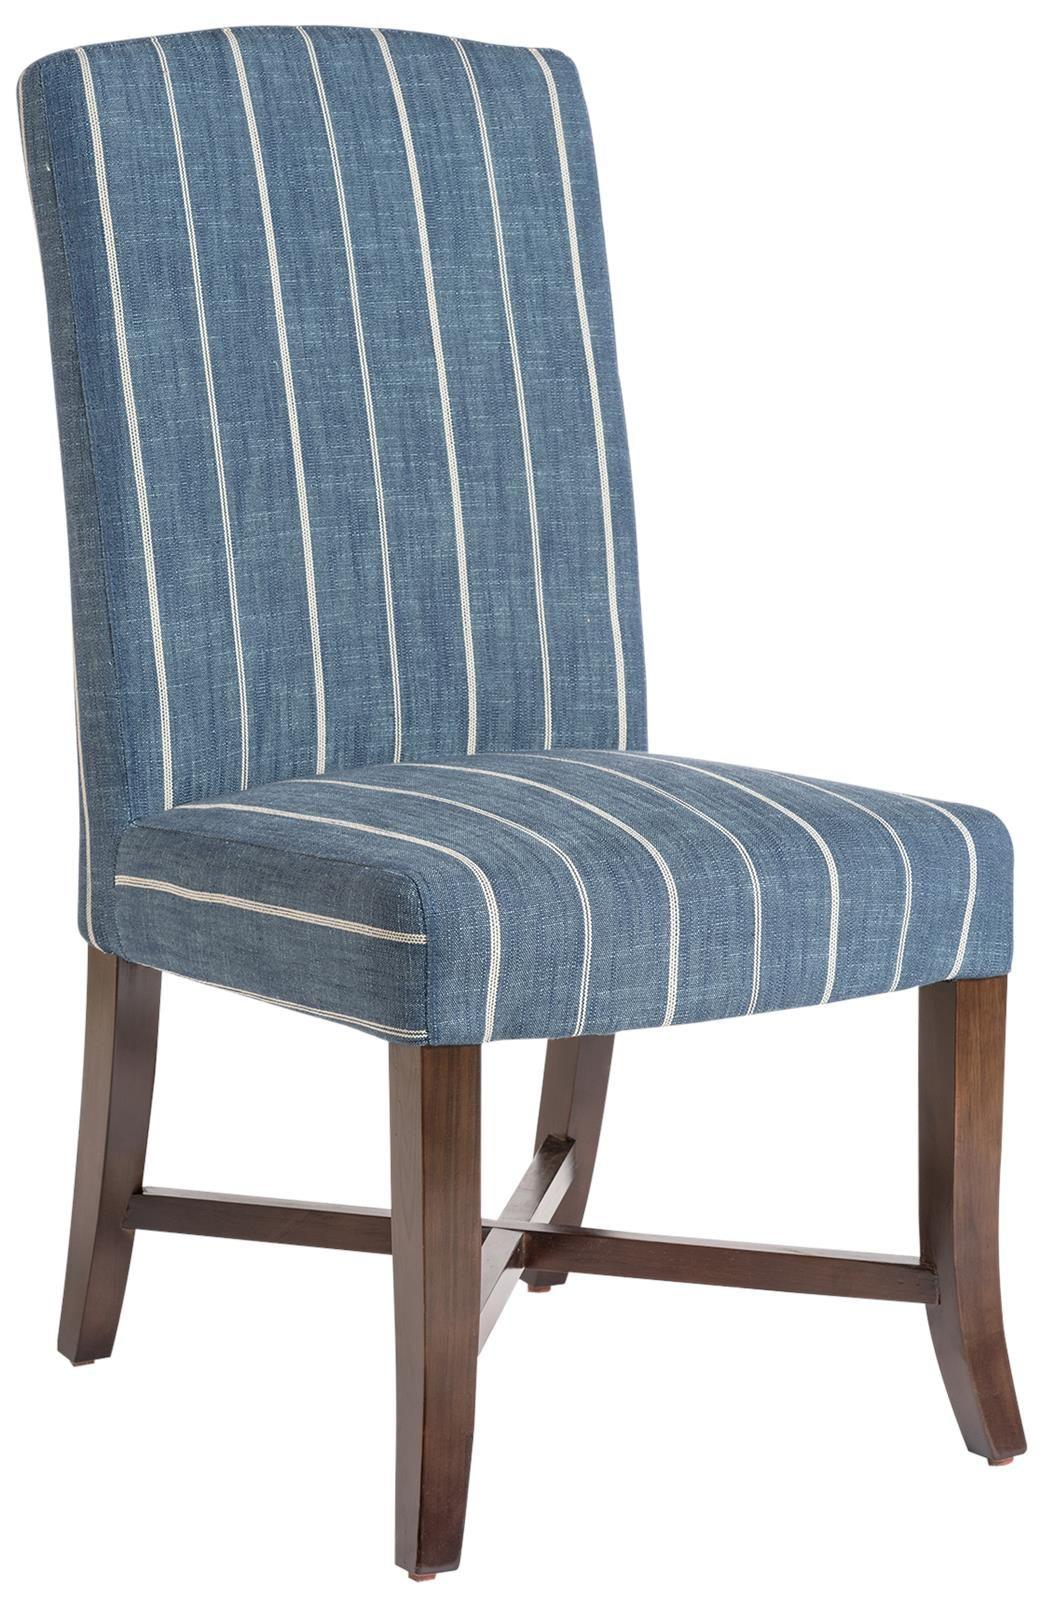 Dining Chair Mercer Revere Indigo Blue Stripe Fabric Dark Walnut Wood Pair Furniture Upholstery Birchwood Diningchair